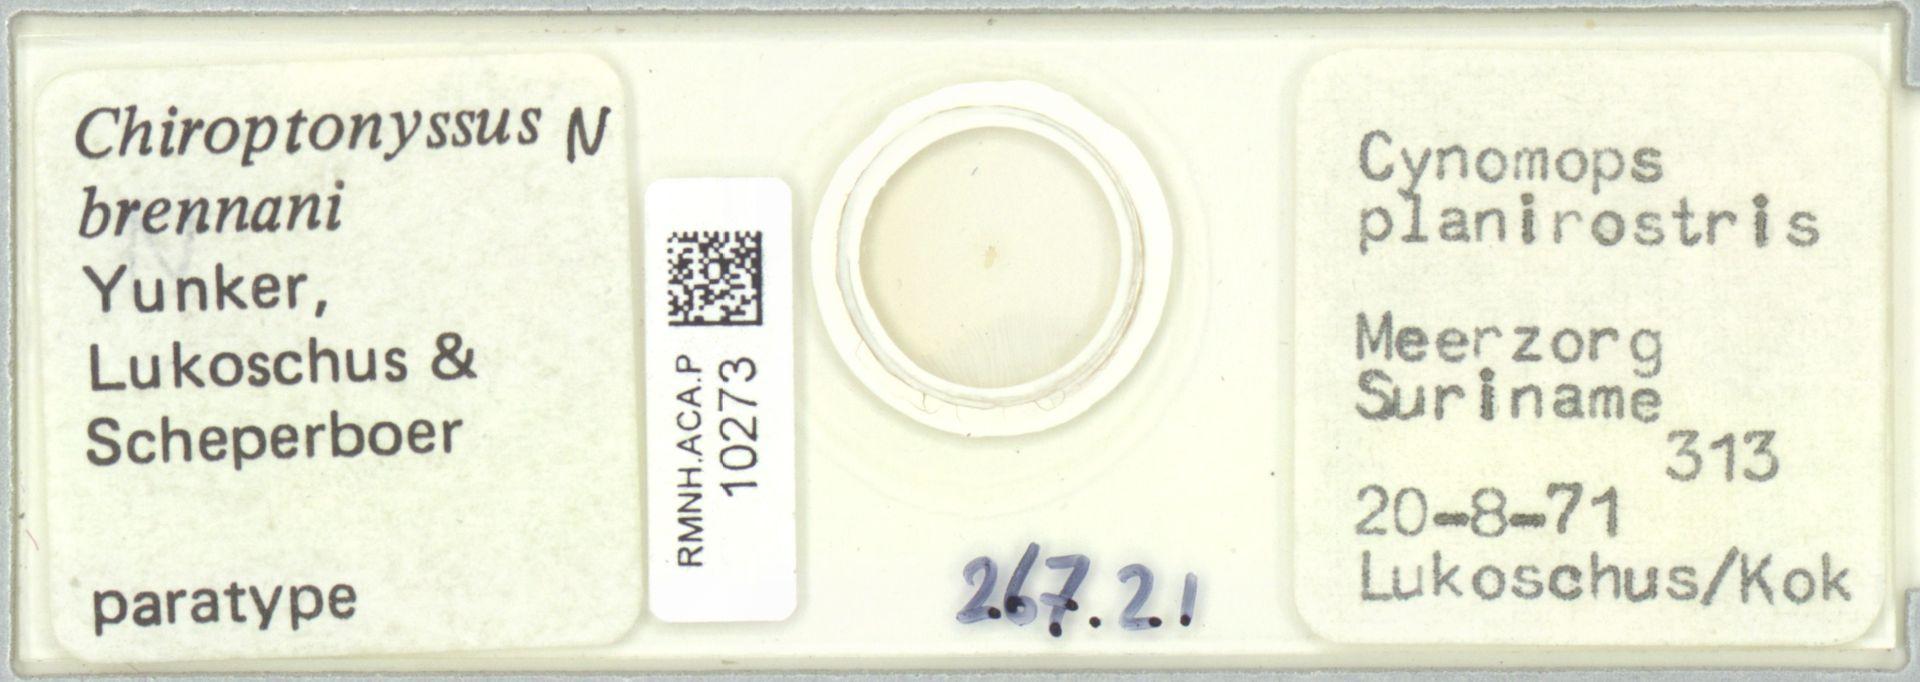 RMNH.ACA.P.10273 | Chiroptonyssus brennani Yunker, Lukoschus & Scheperboer